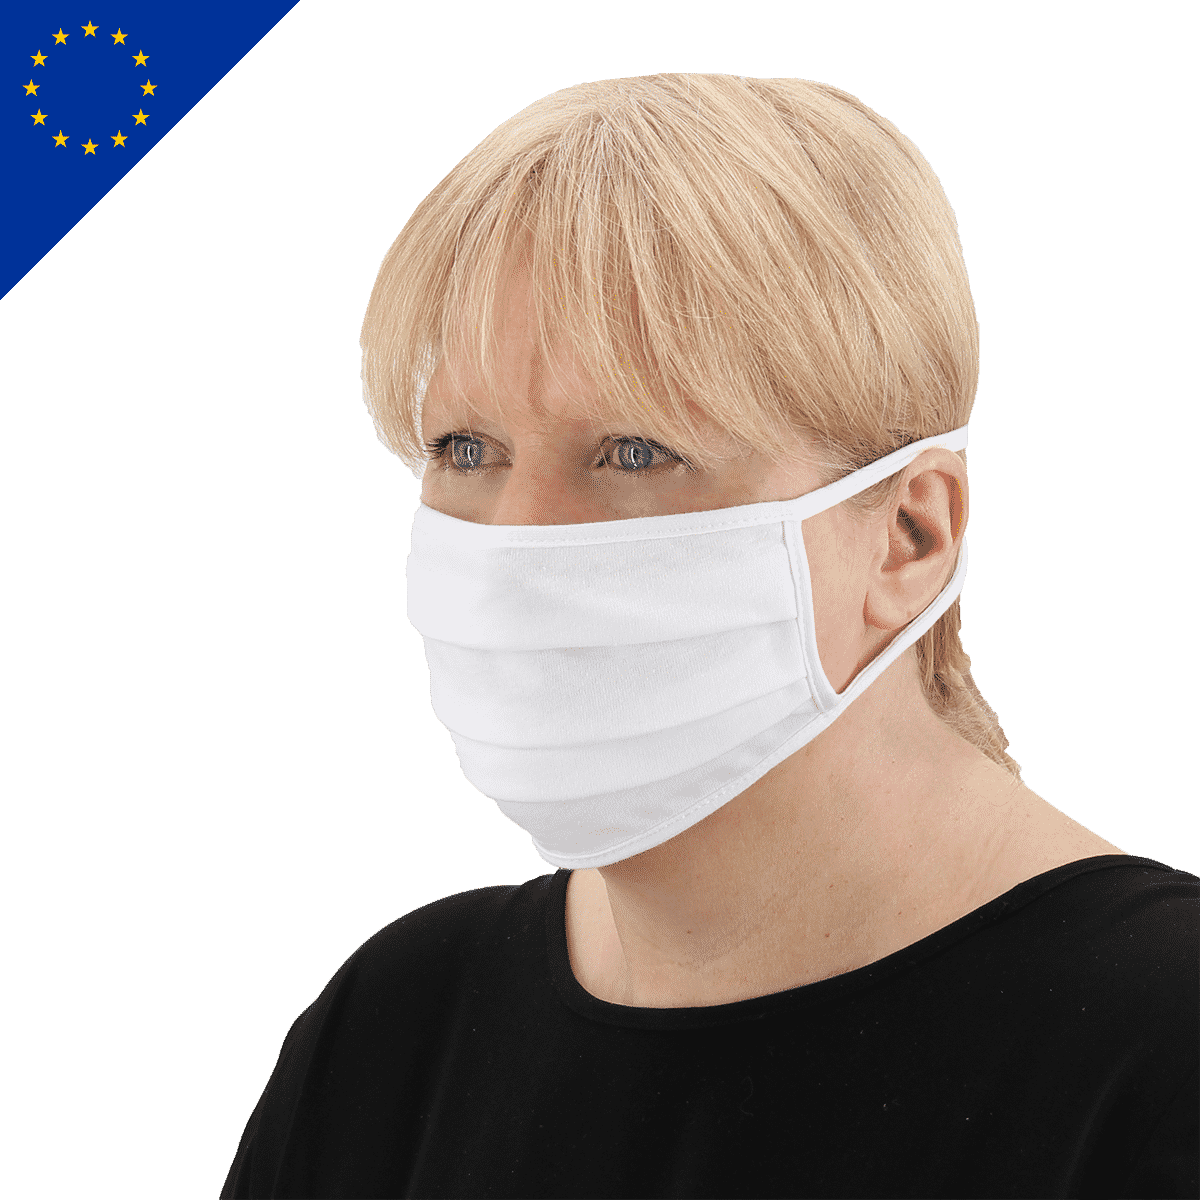 Maske zum Binden Made in EU